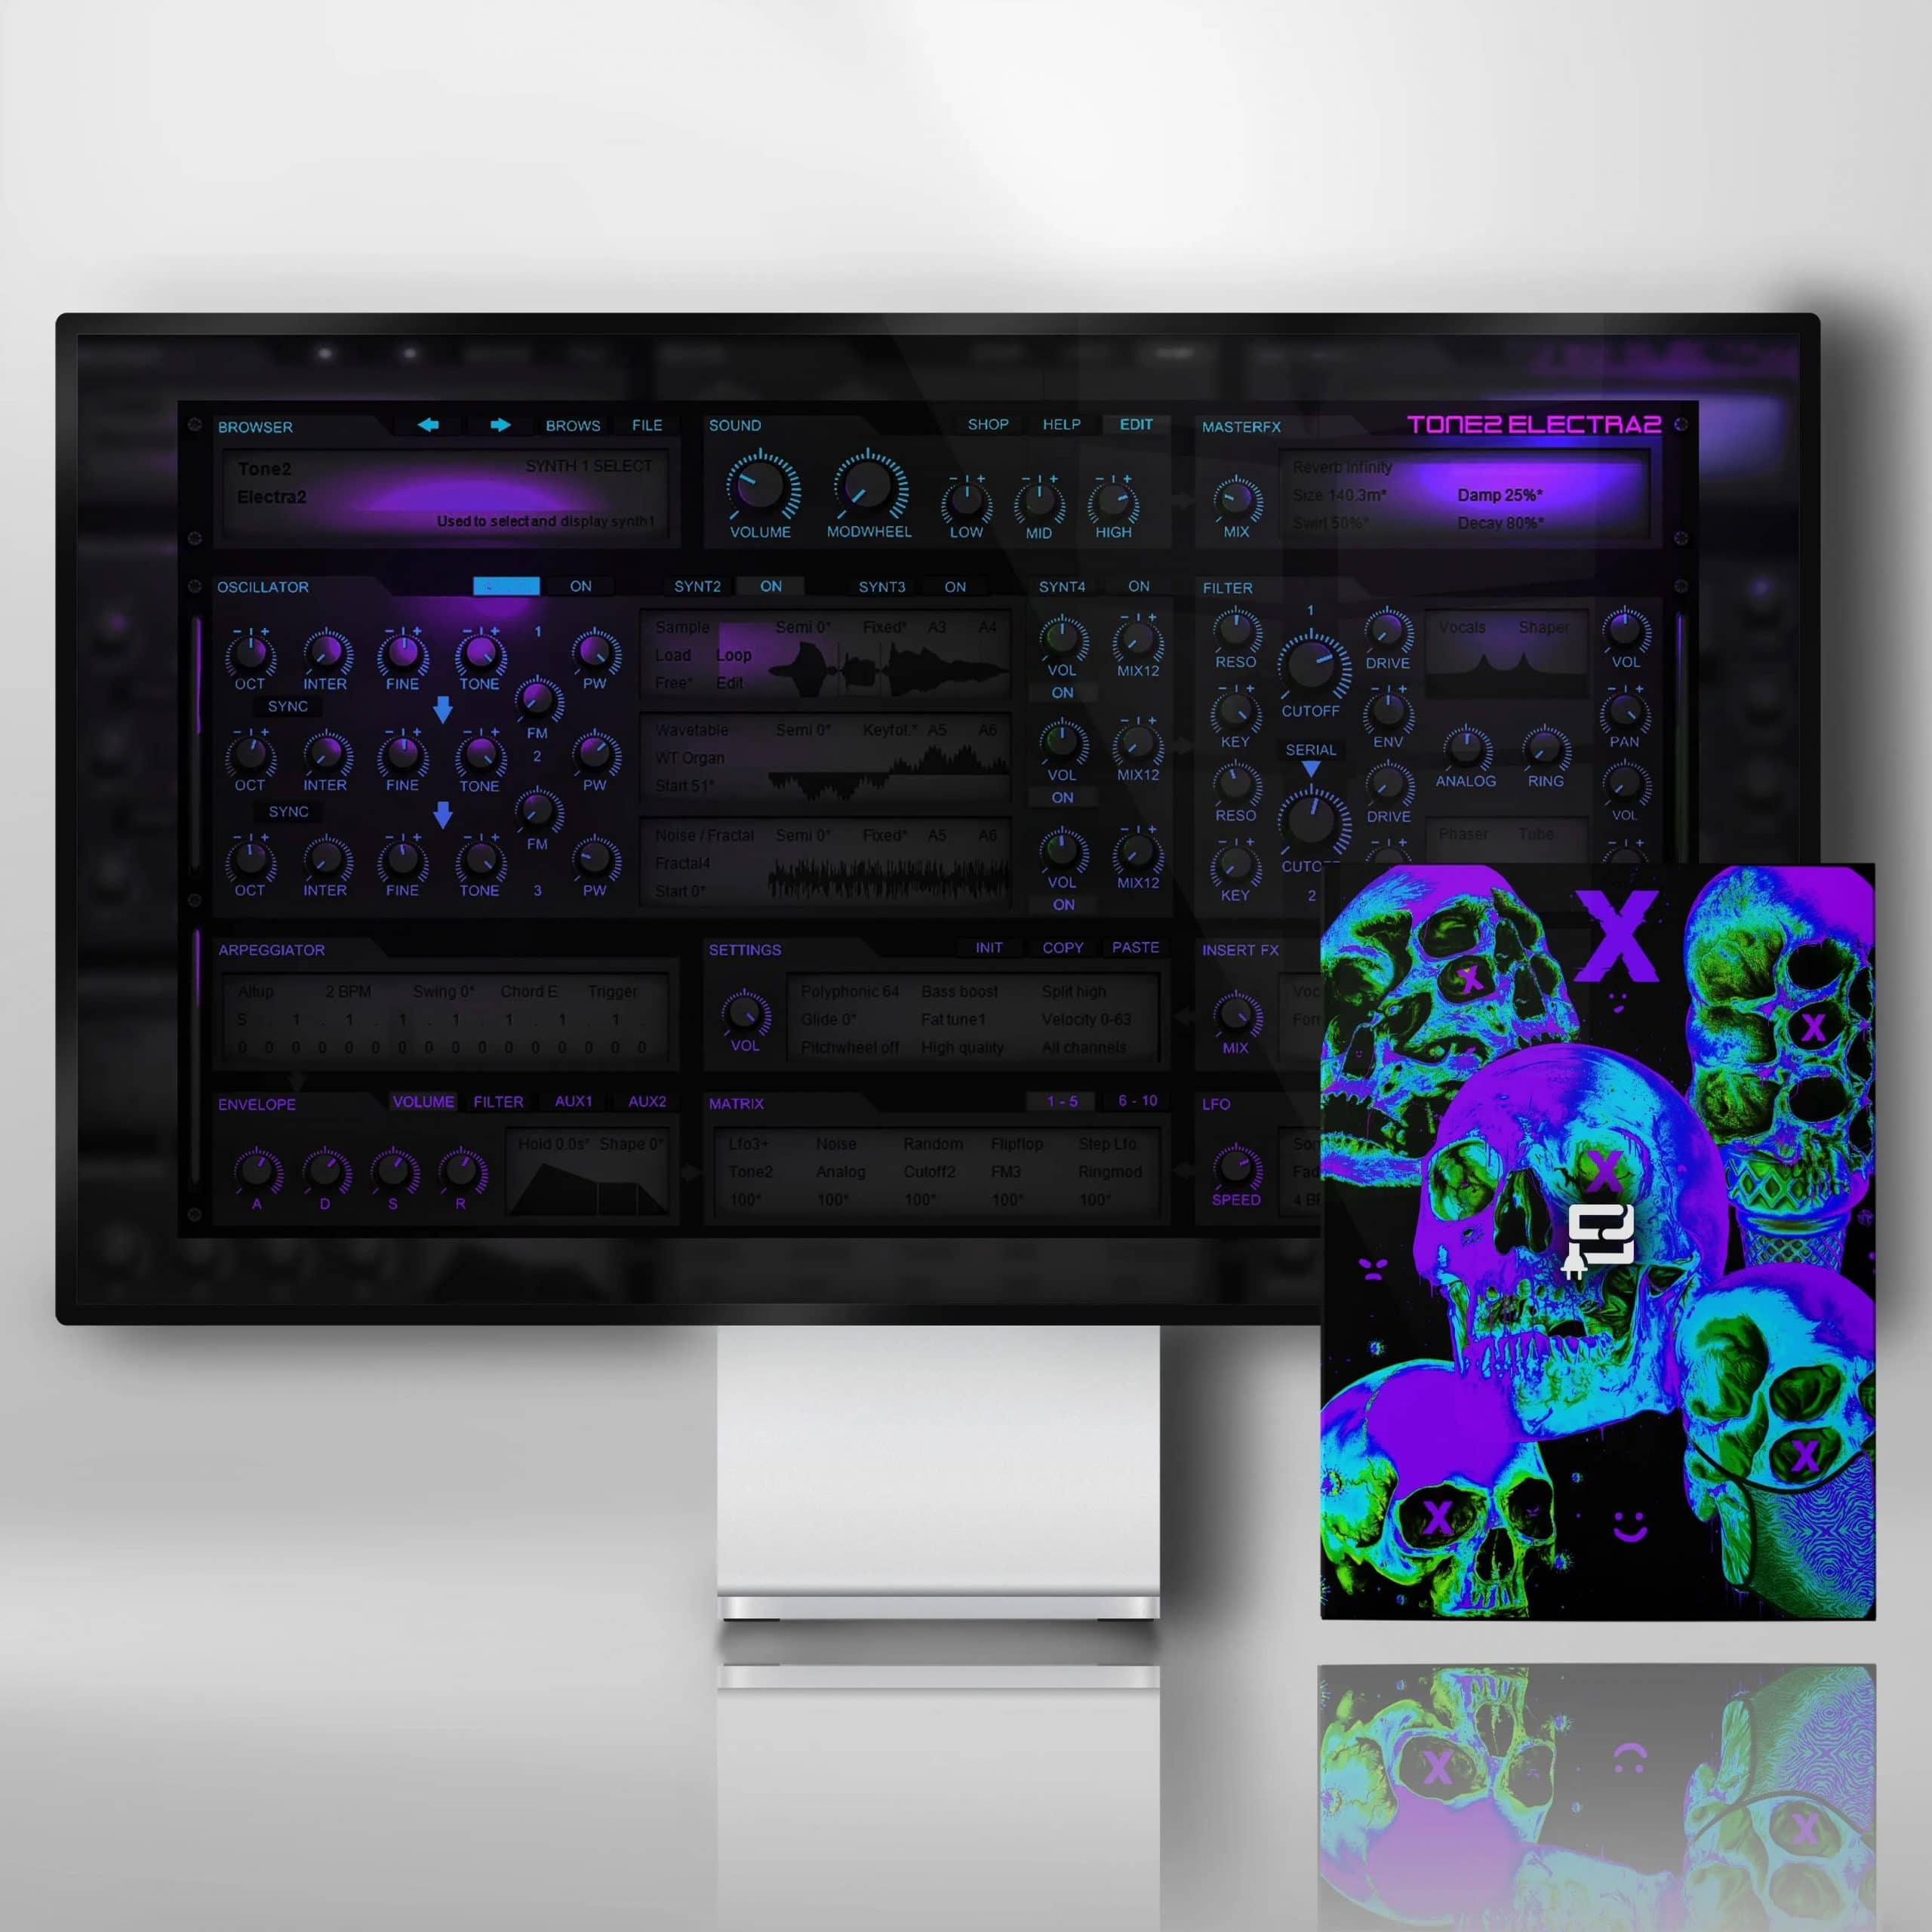 StudioPlug – Ghost Face (Electrax Bank)